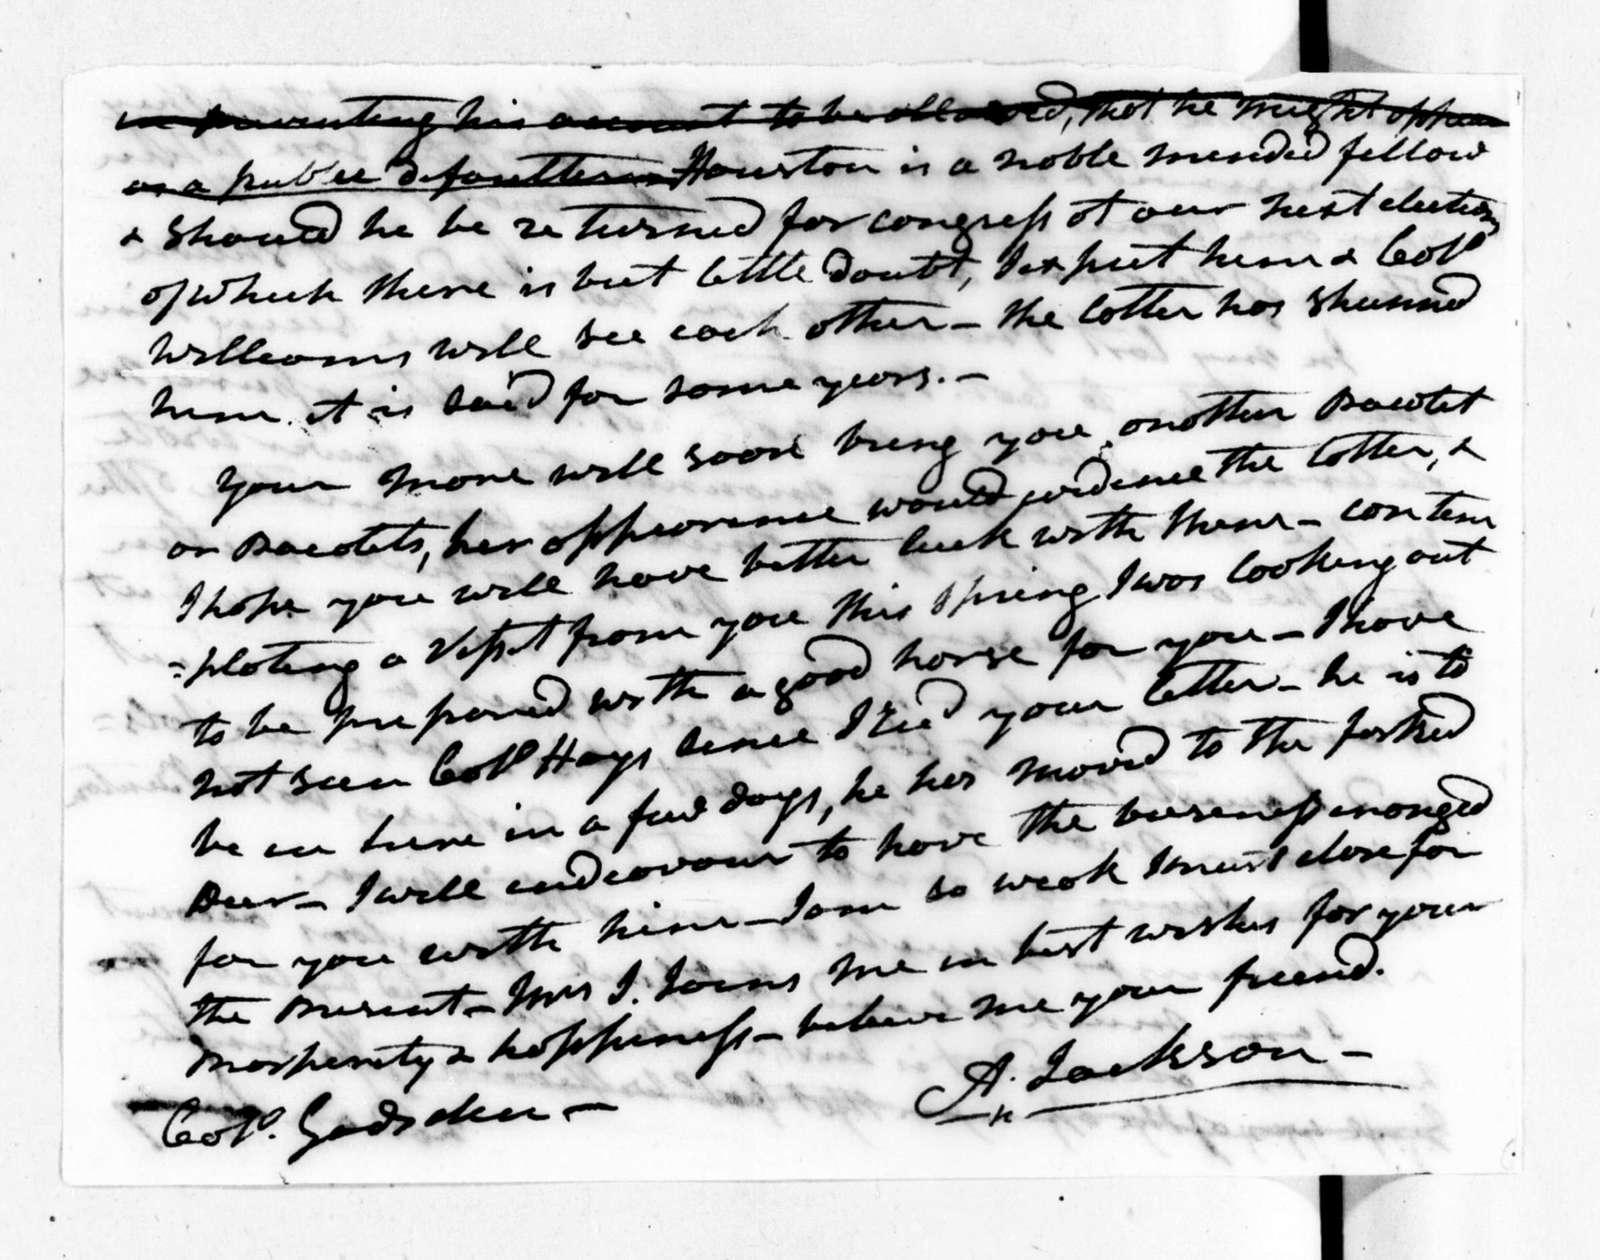 Andrew Jackson to James Gadsden, May 2, 1822